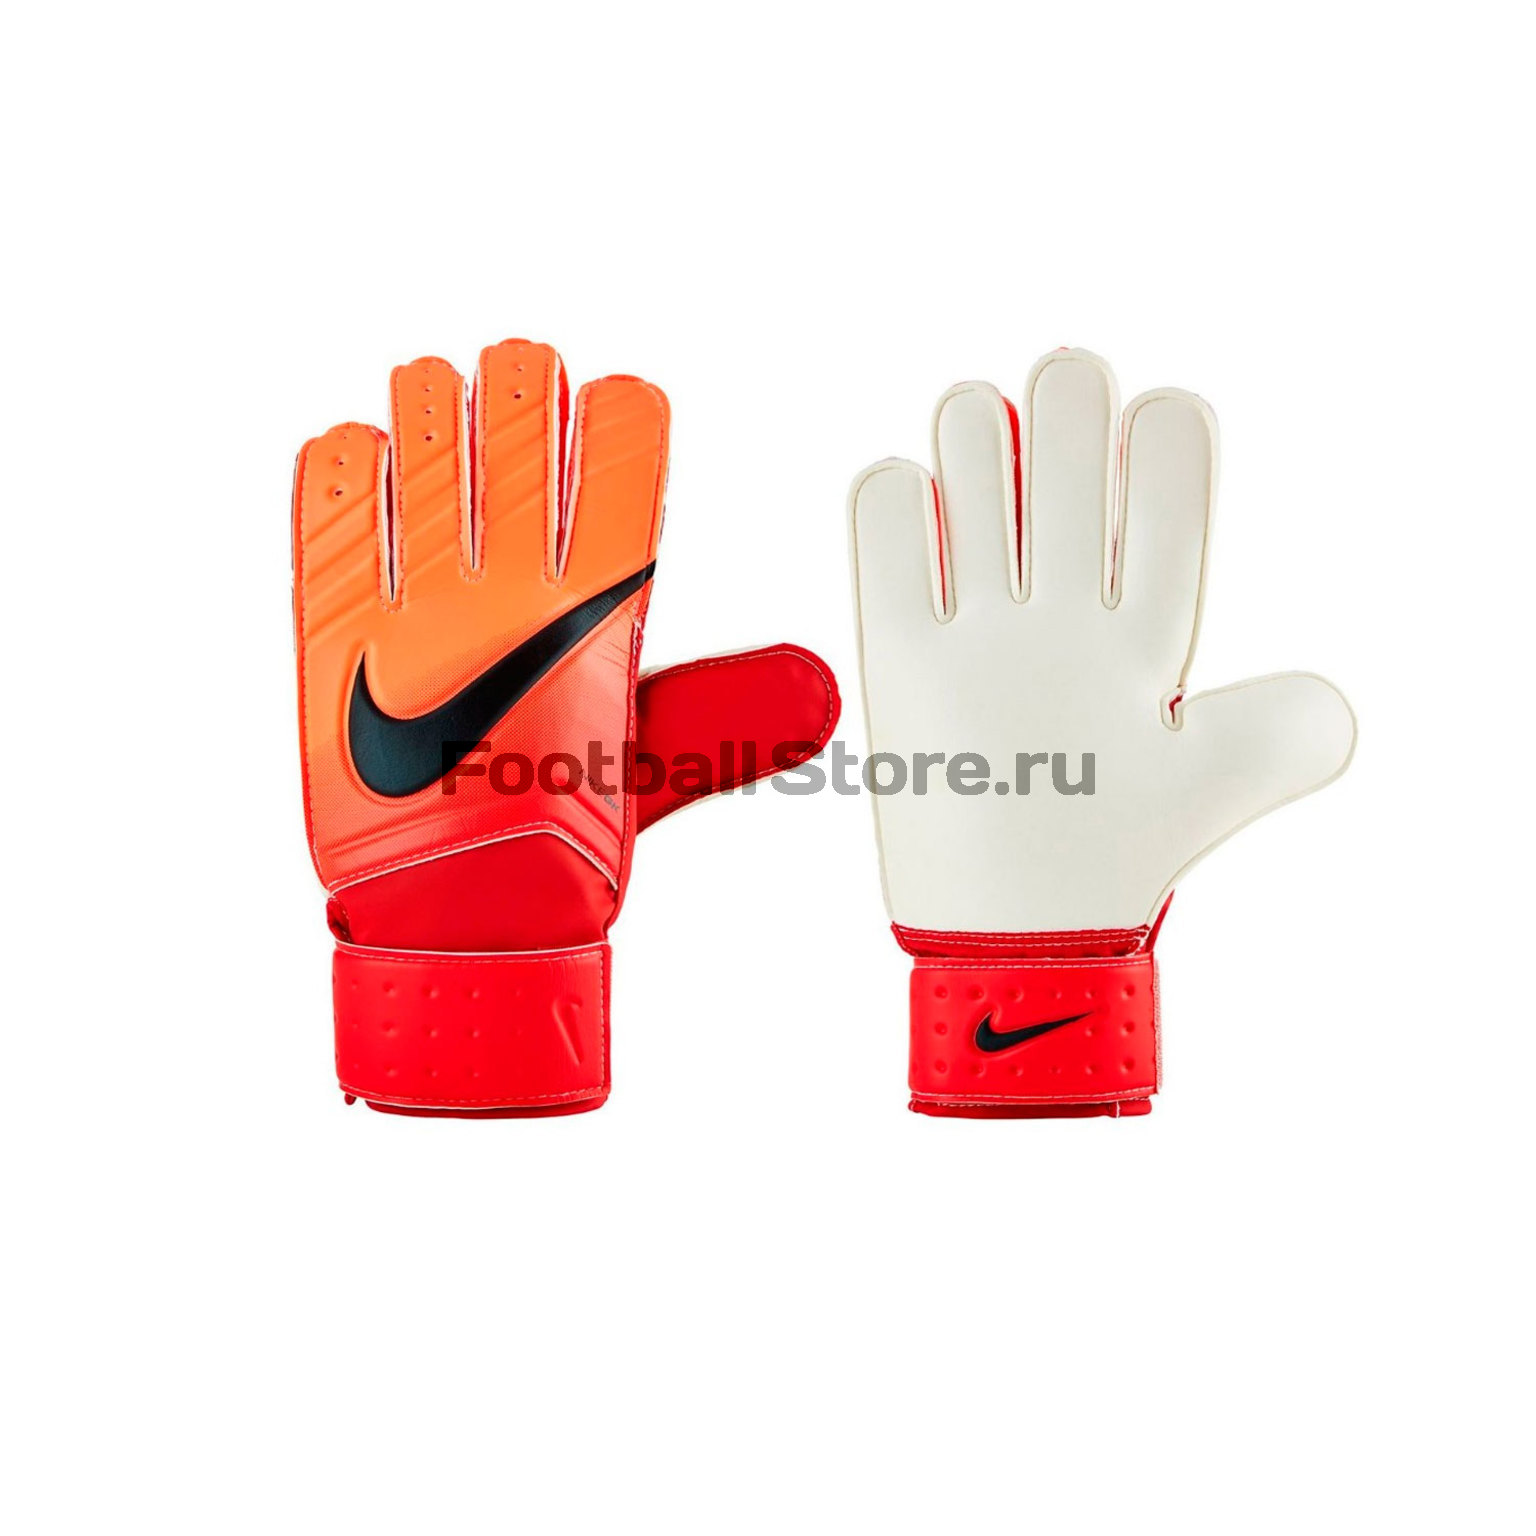 Перчатки Nike Перчатки вратарские Nike GK Match FA16 GS0330-657